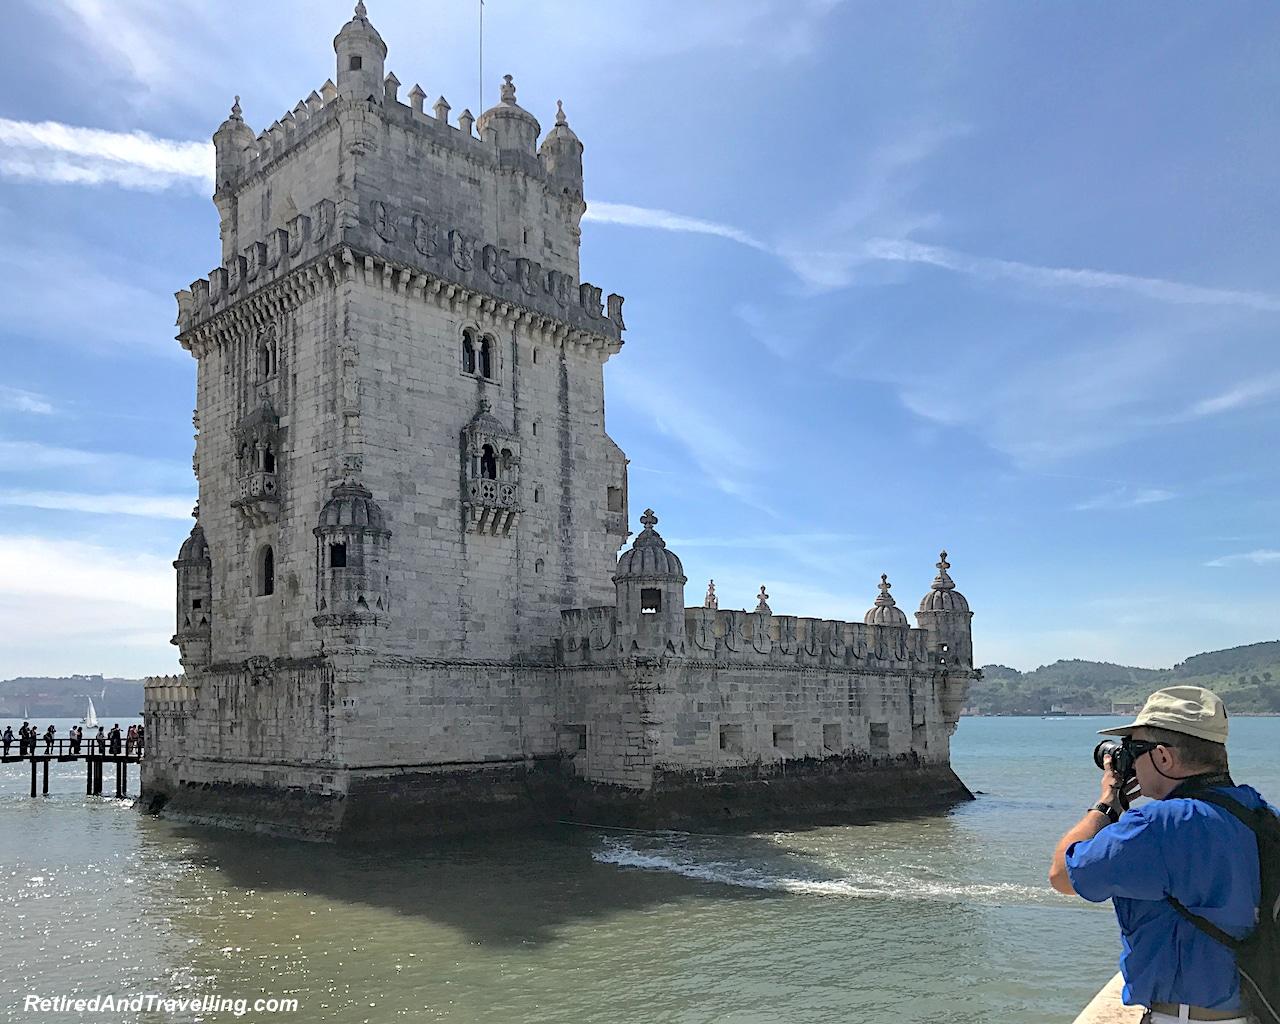 Belem Tower - Explore The Belem Area in Lisbon.jpg